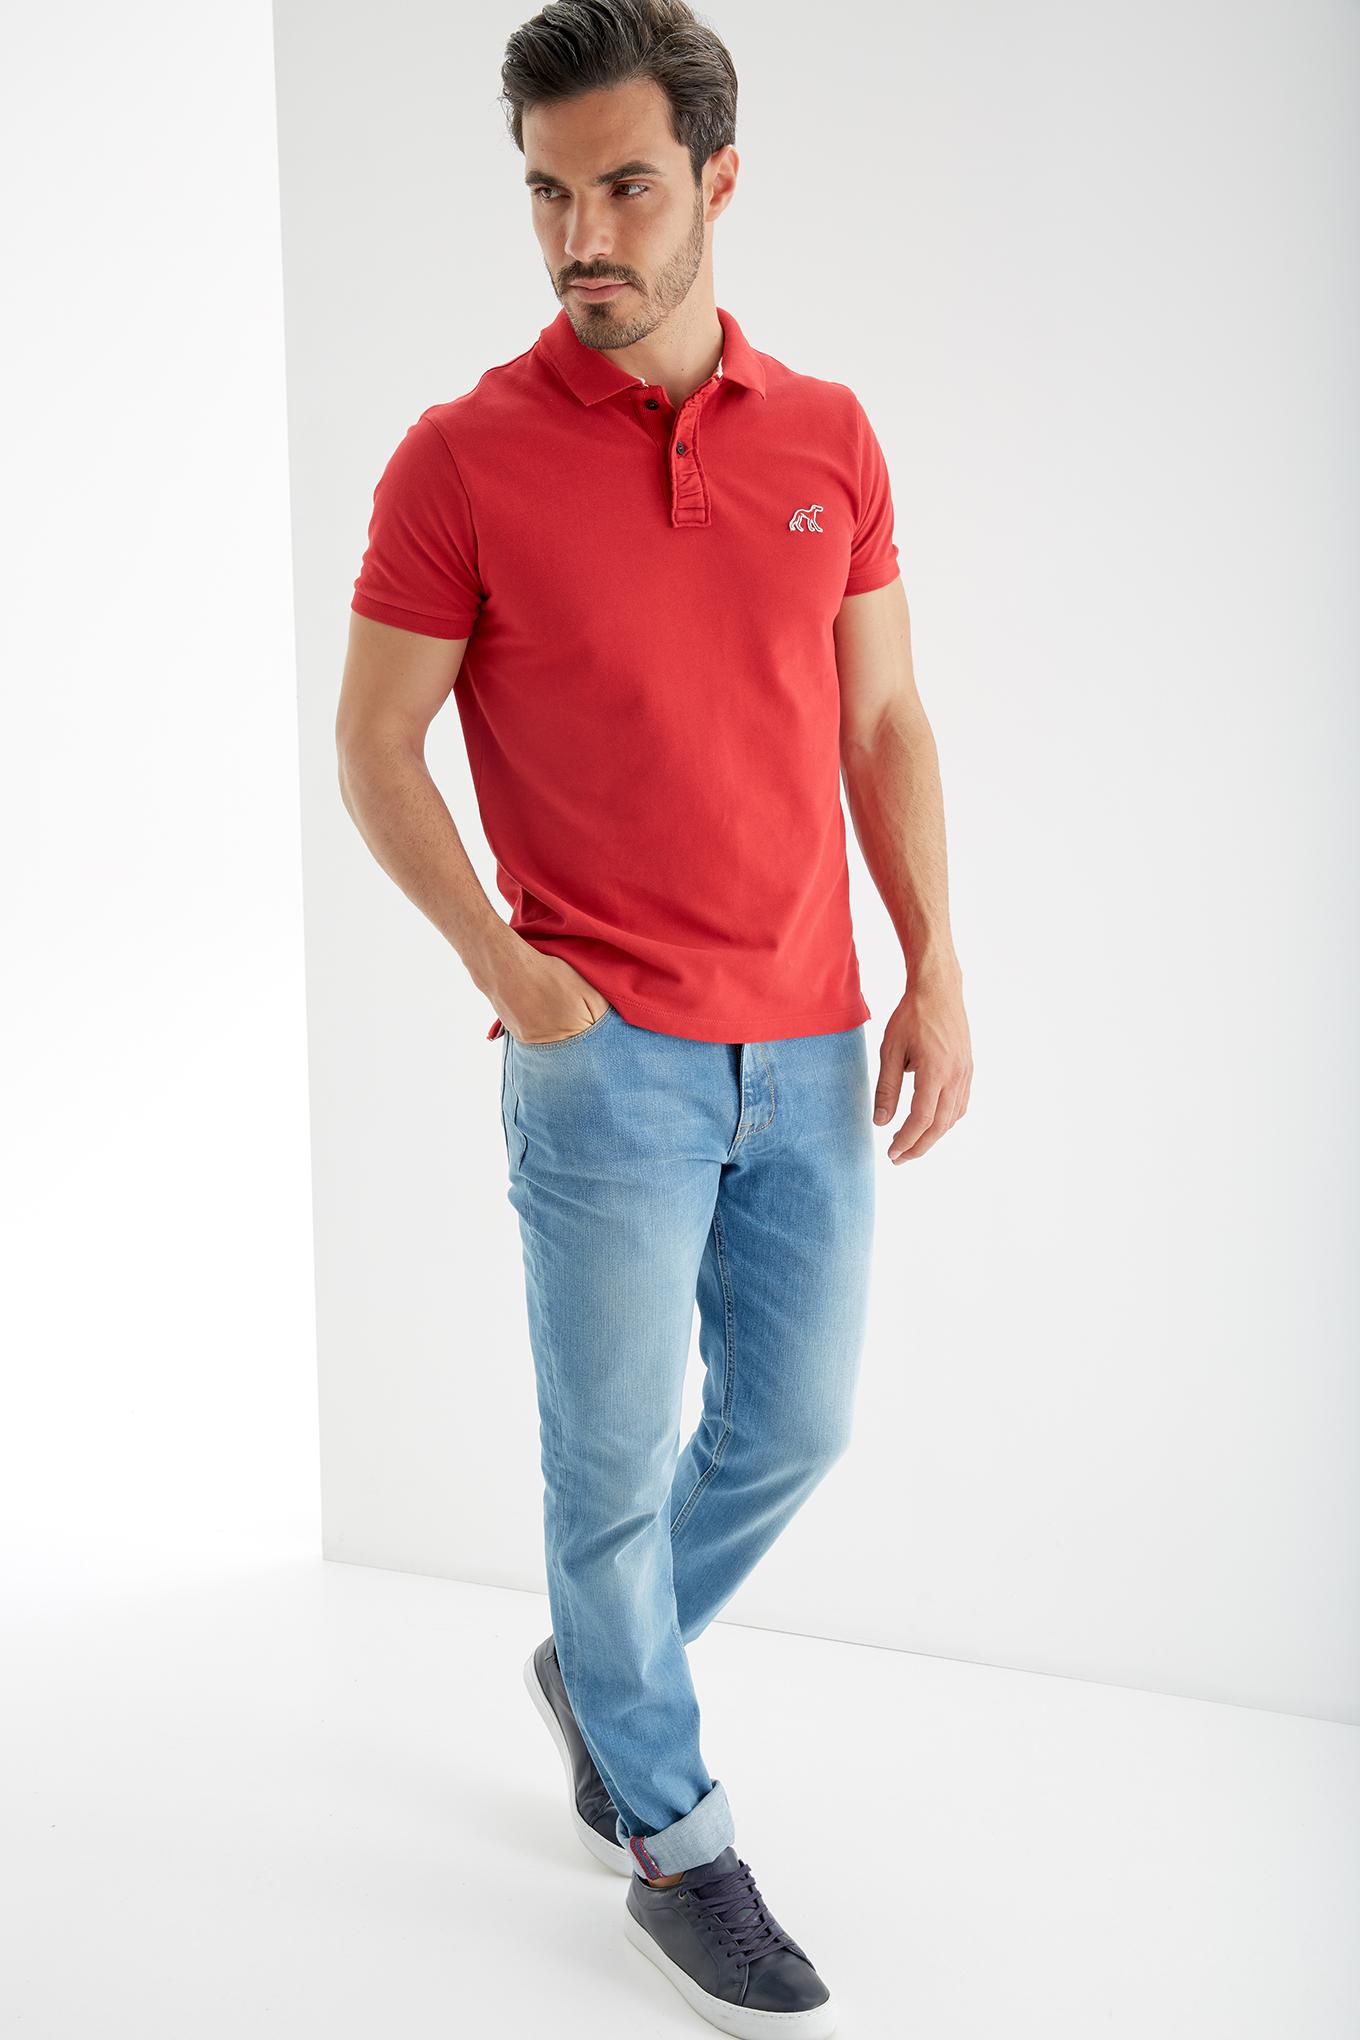 Polo Piquet Red Sport Man